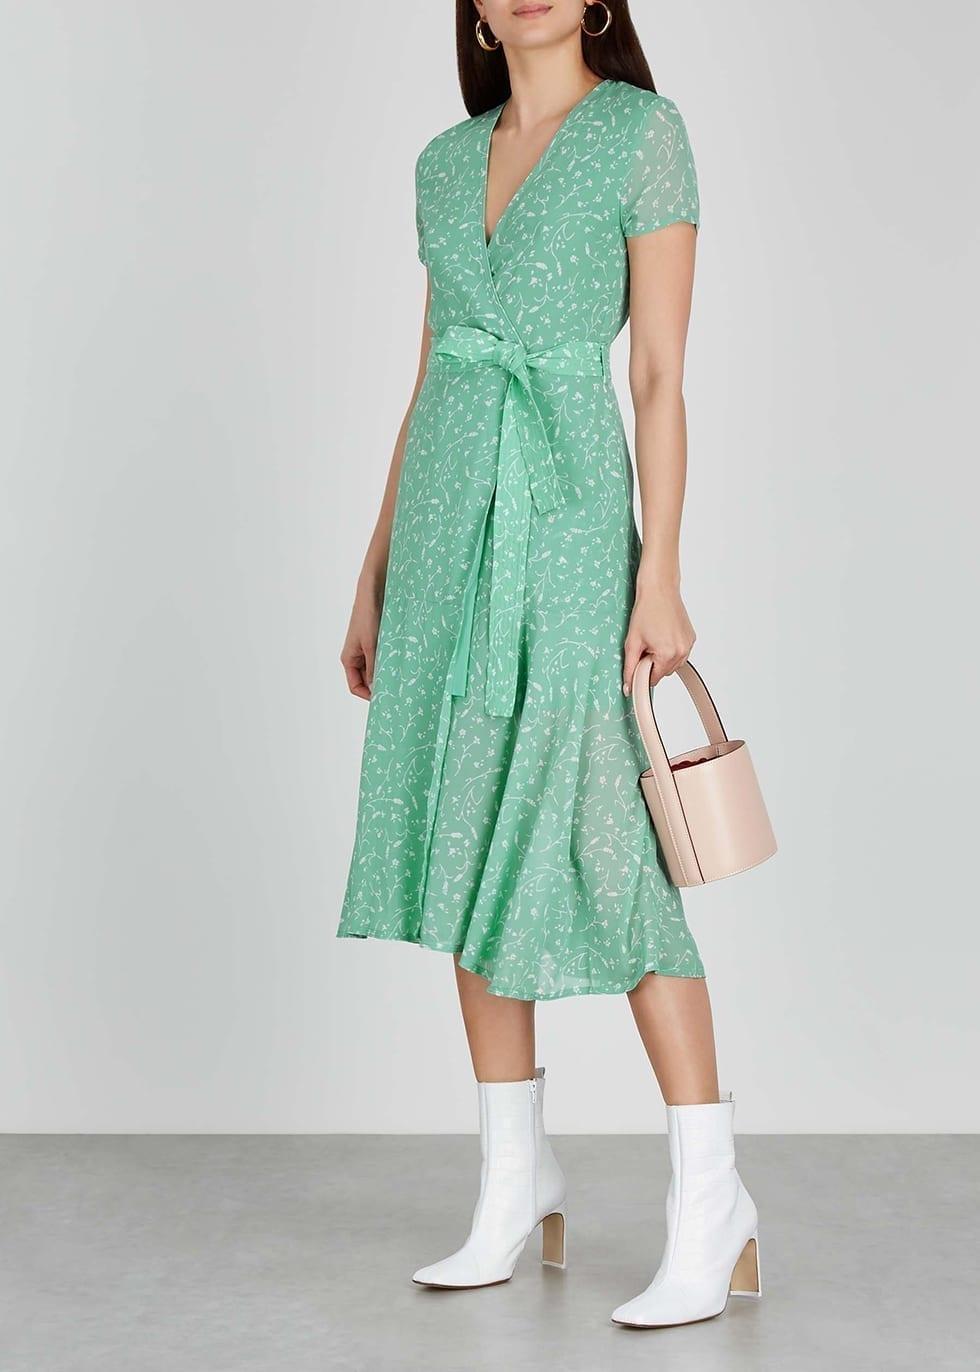 SAMSØE & SAMSØE Green Floral-print Midi Dress